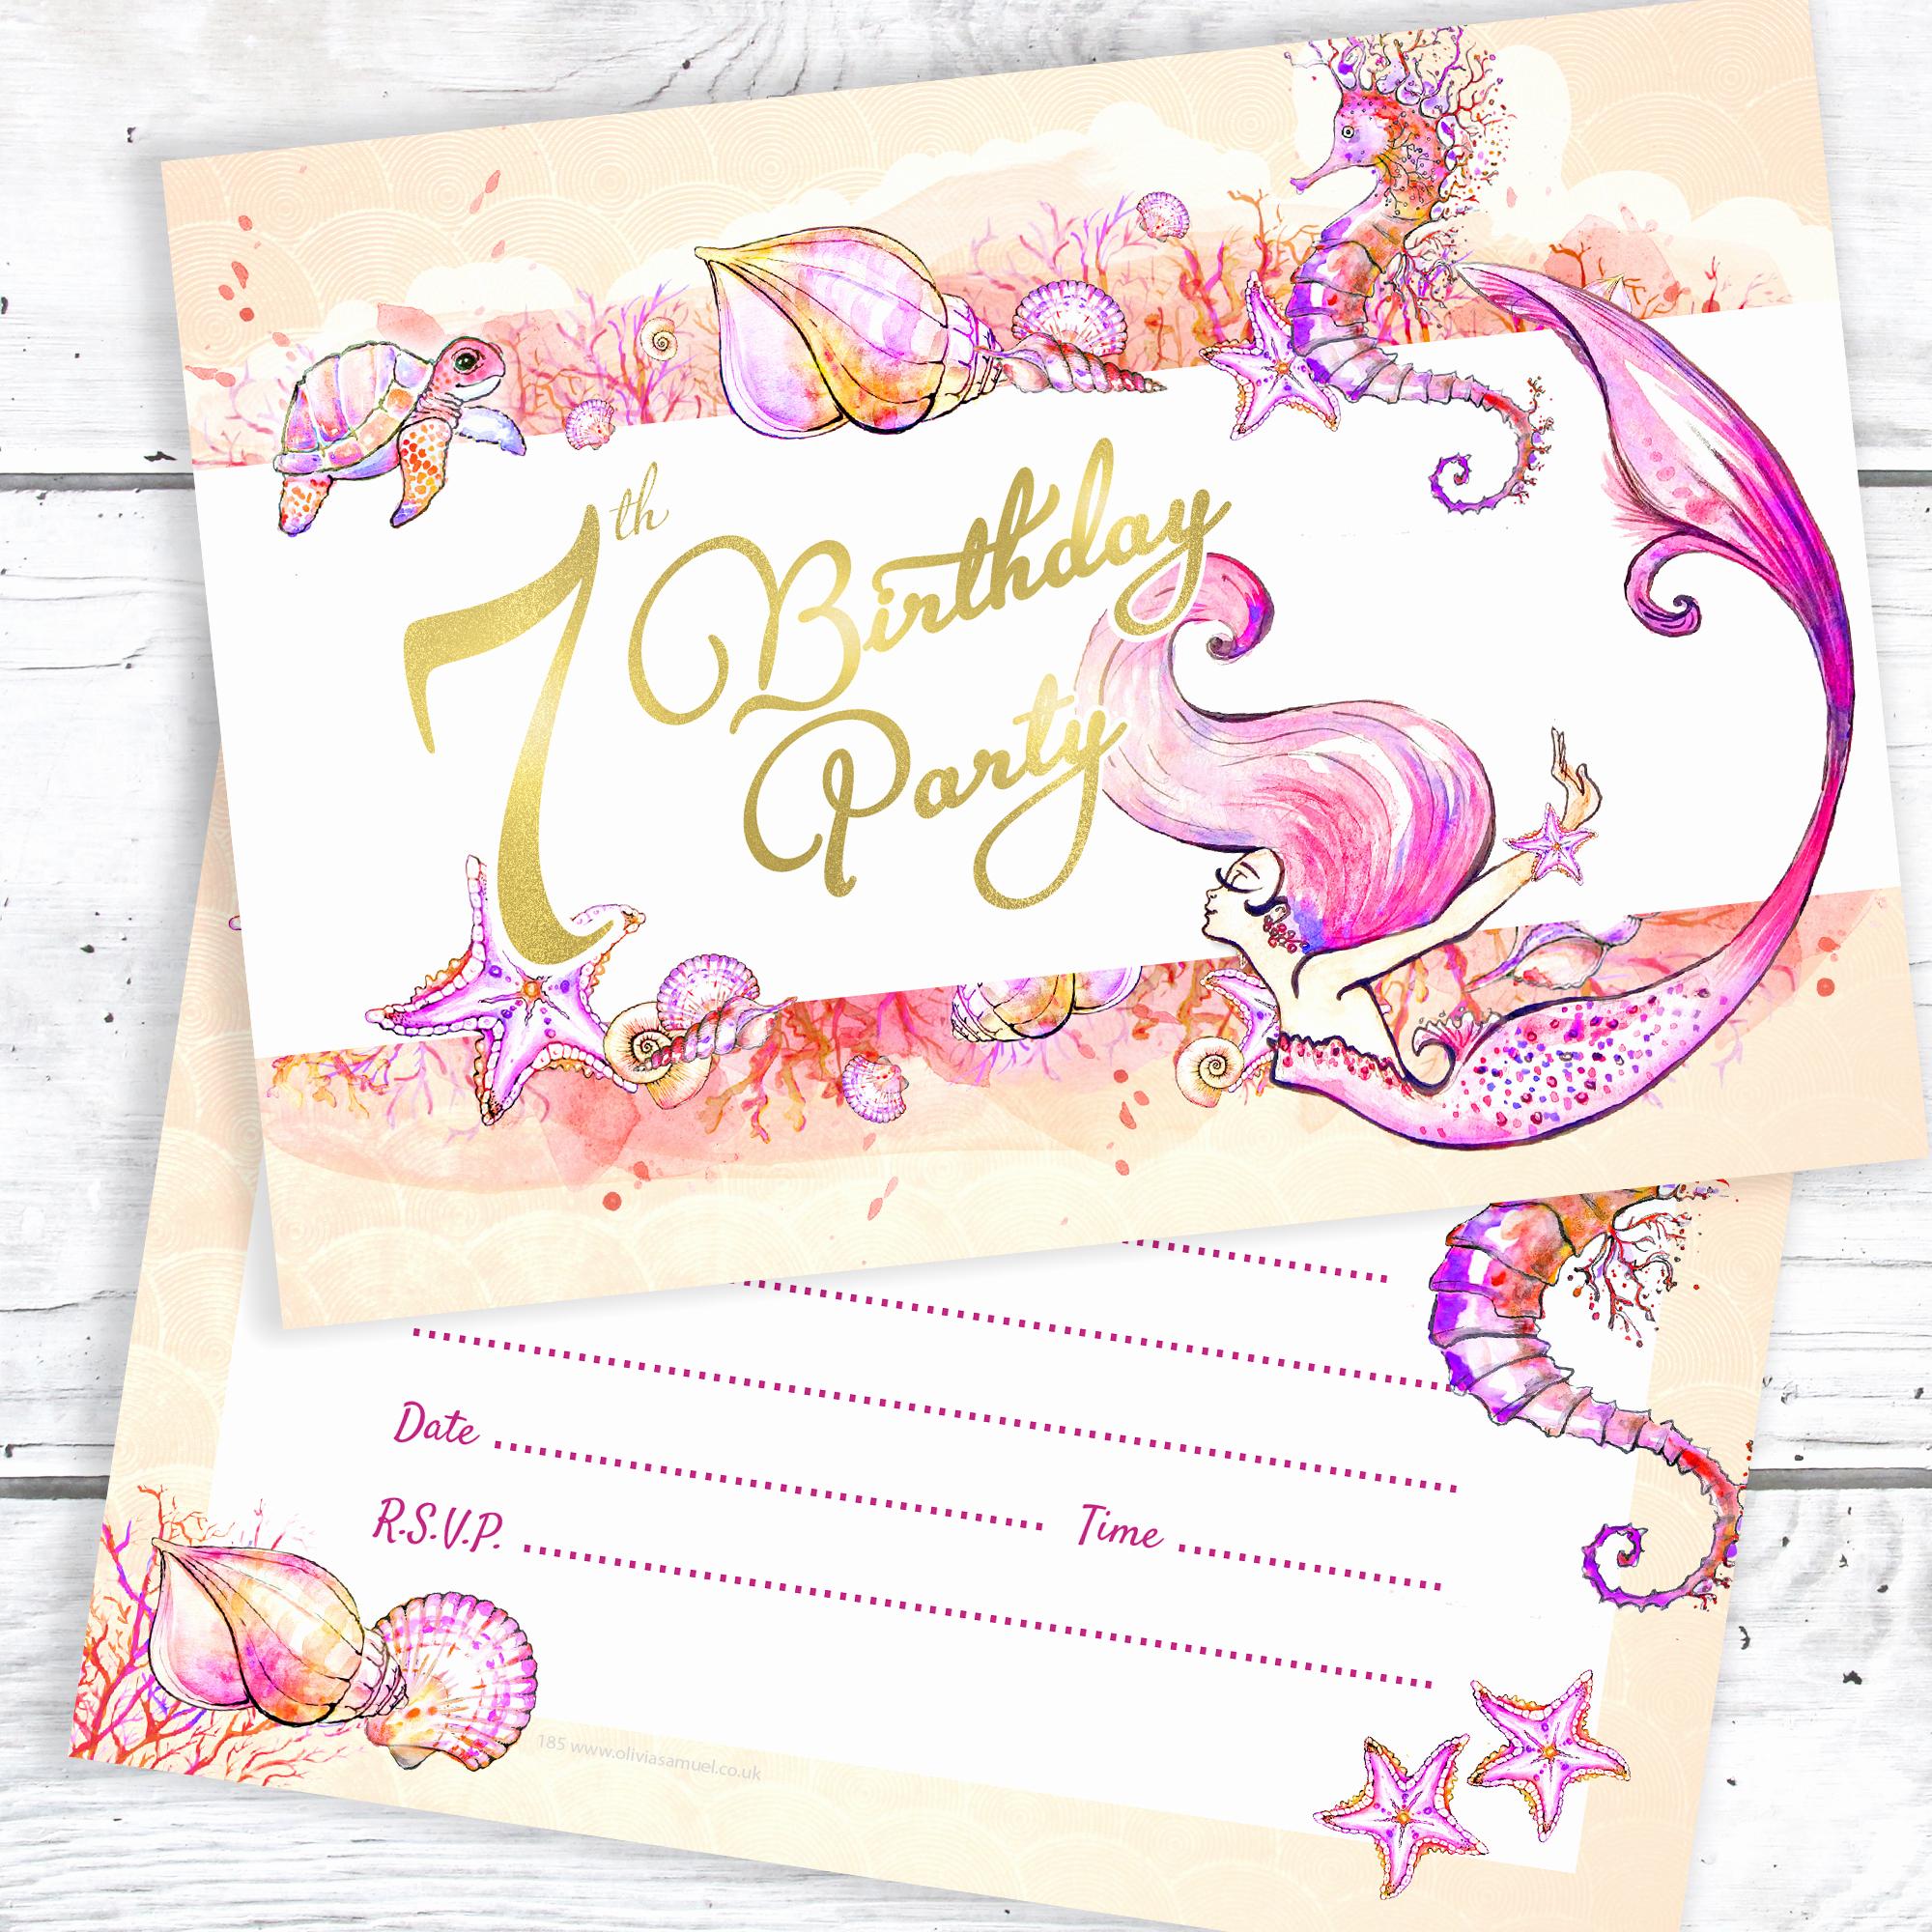 7th Birthday Invitation Wording New Mermaid 7th Birthday Party Invitations – Ready to Write